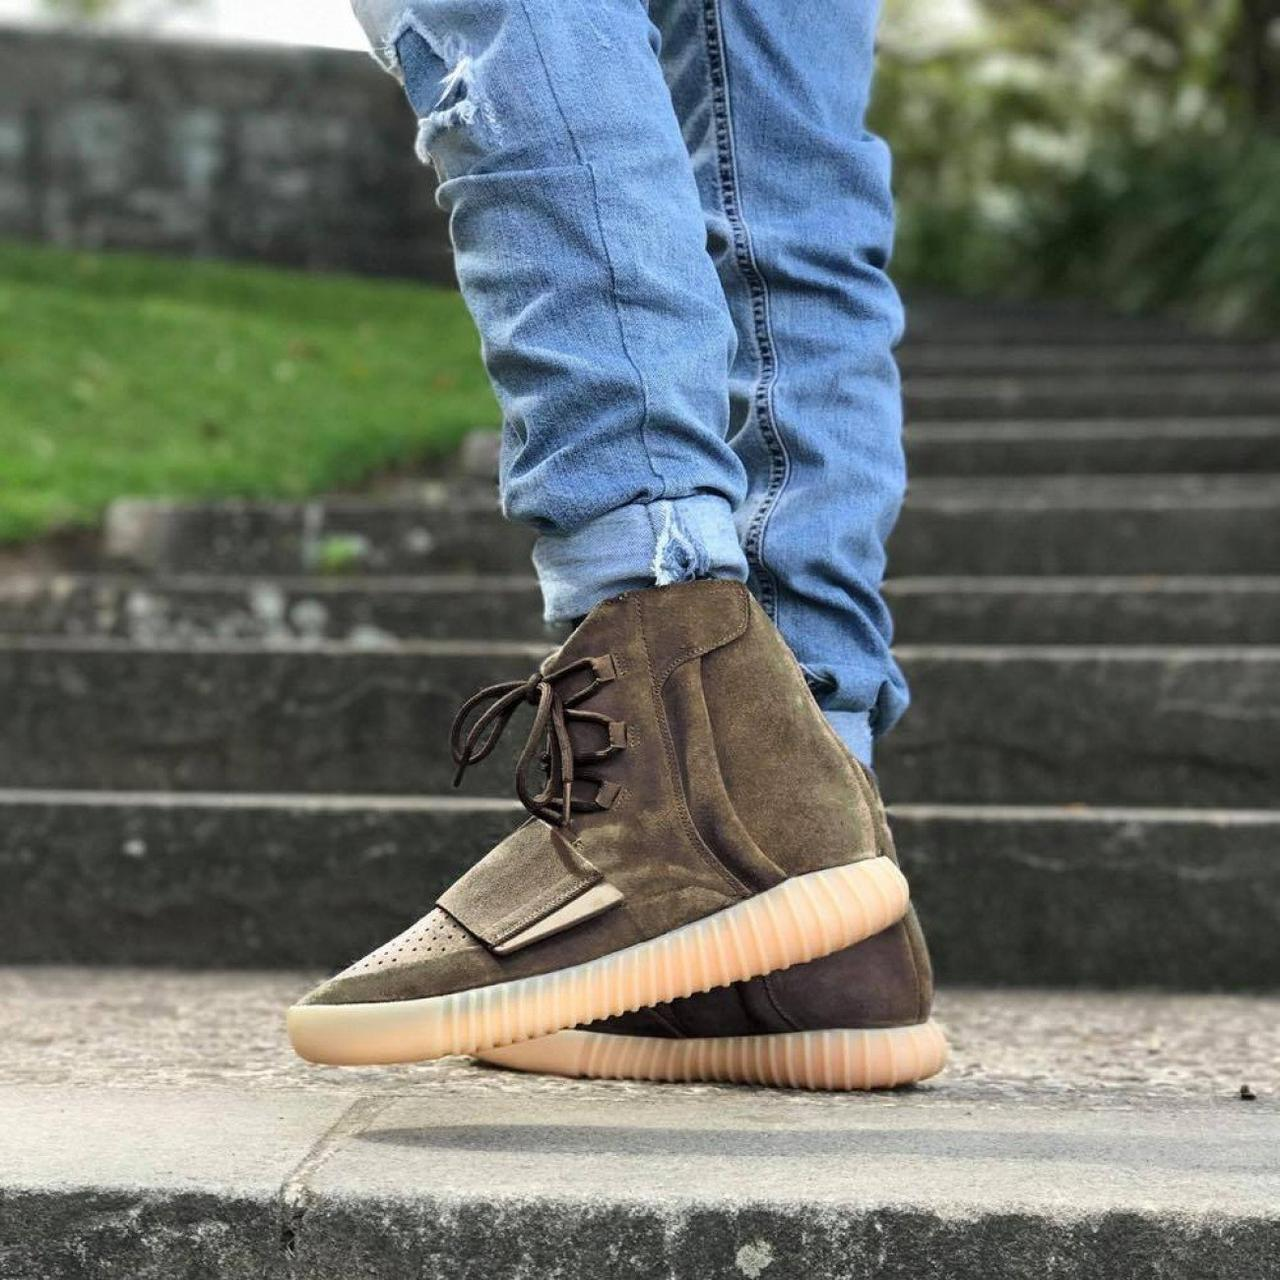 Высокие Мужские Кроссовки Adidas Yeezy Boost 750 Light Brown ... 630450e9281